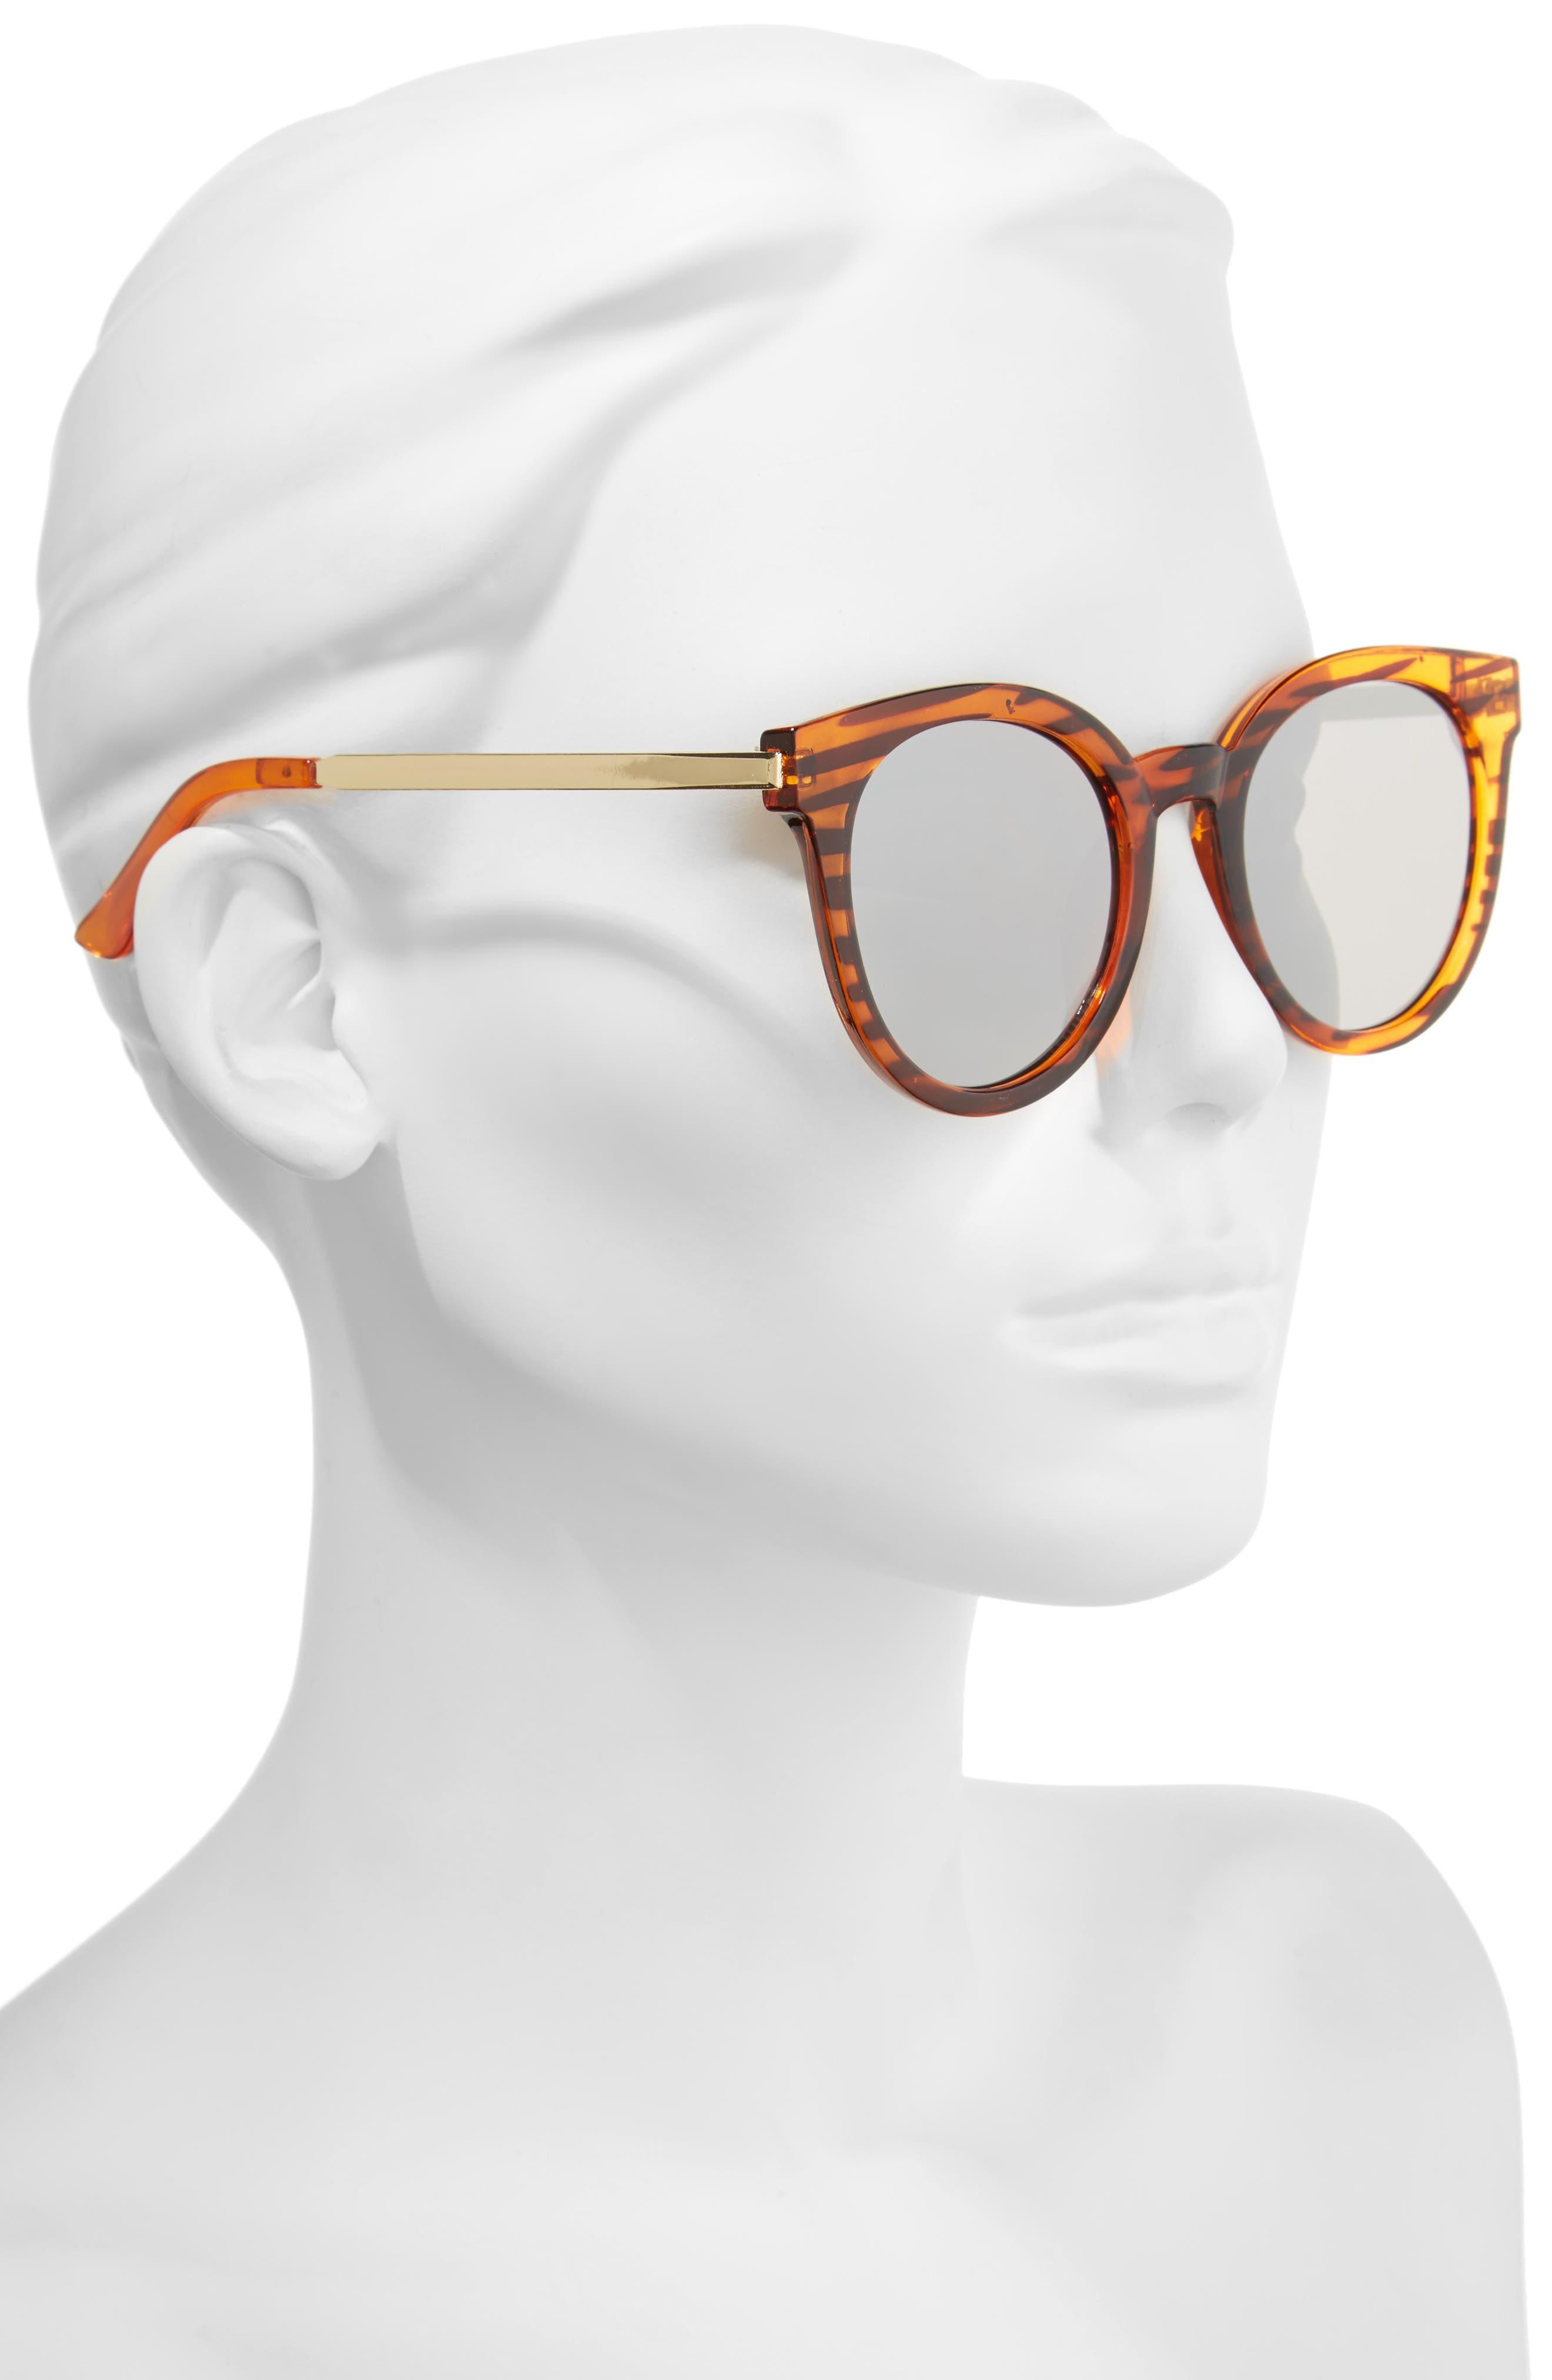 Alternate Image 2  - A.J. Morgan Hi There 50mm Mirrored Round Sunglasses